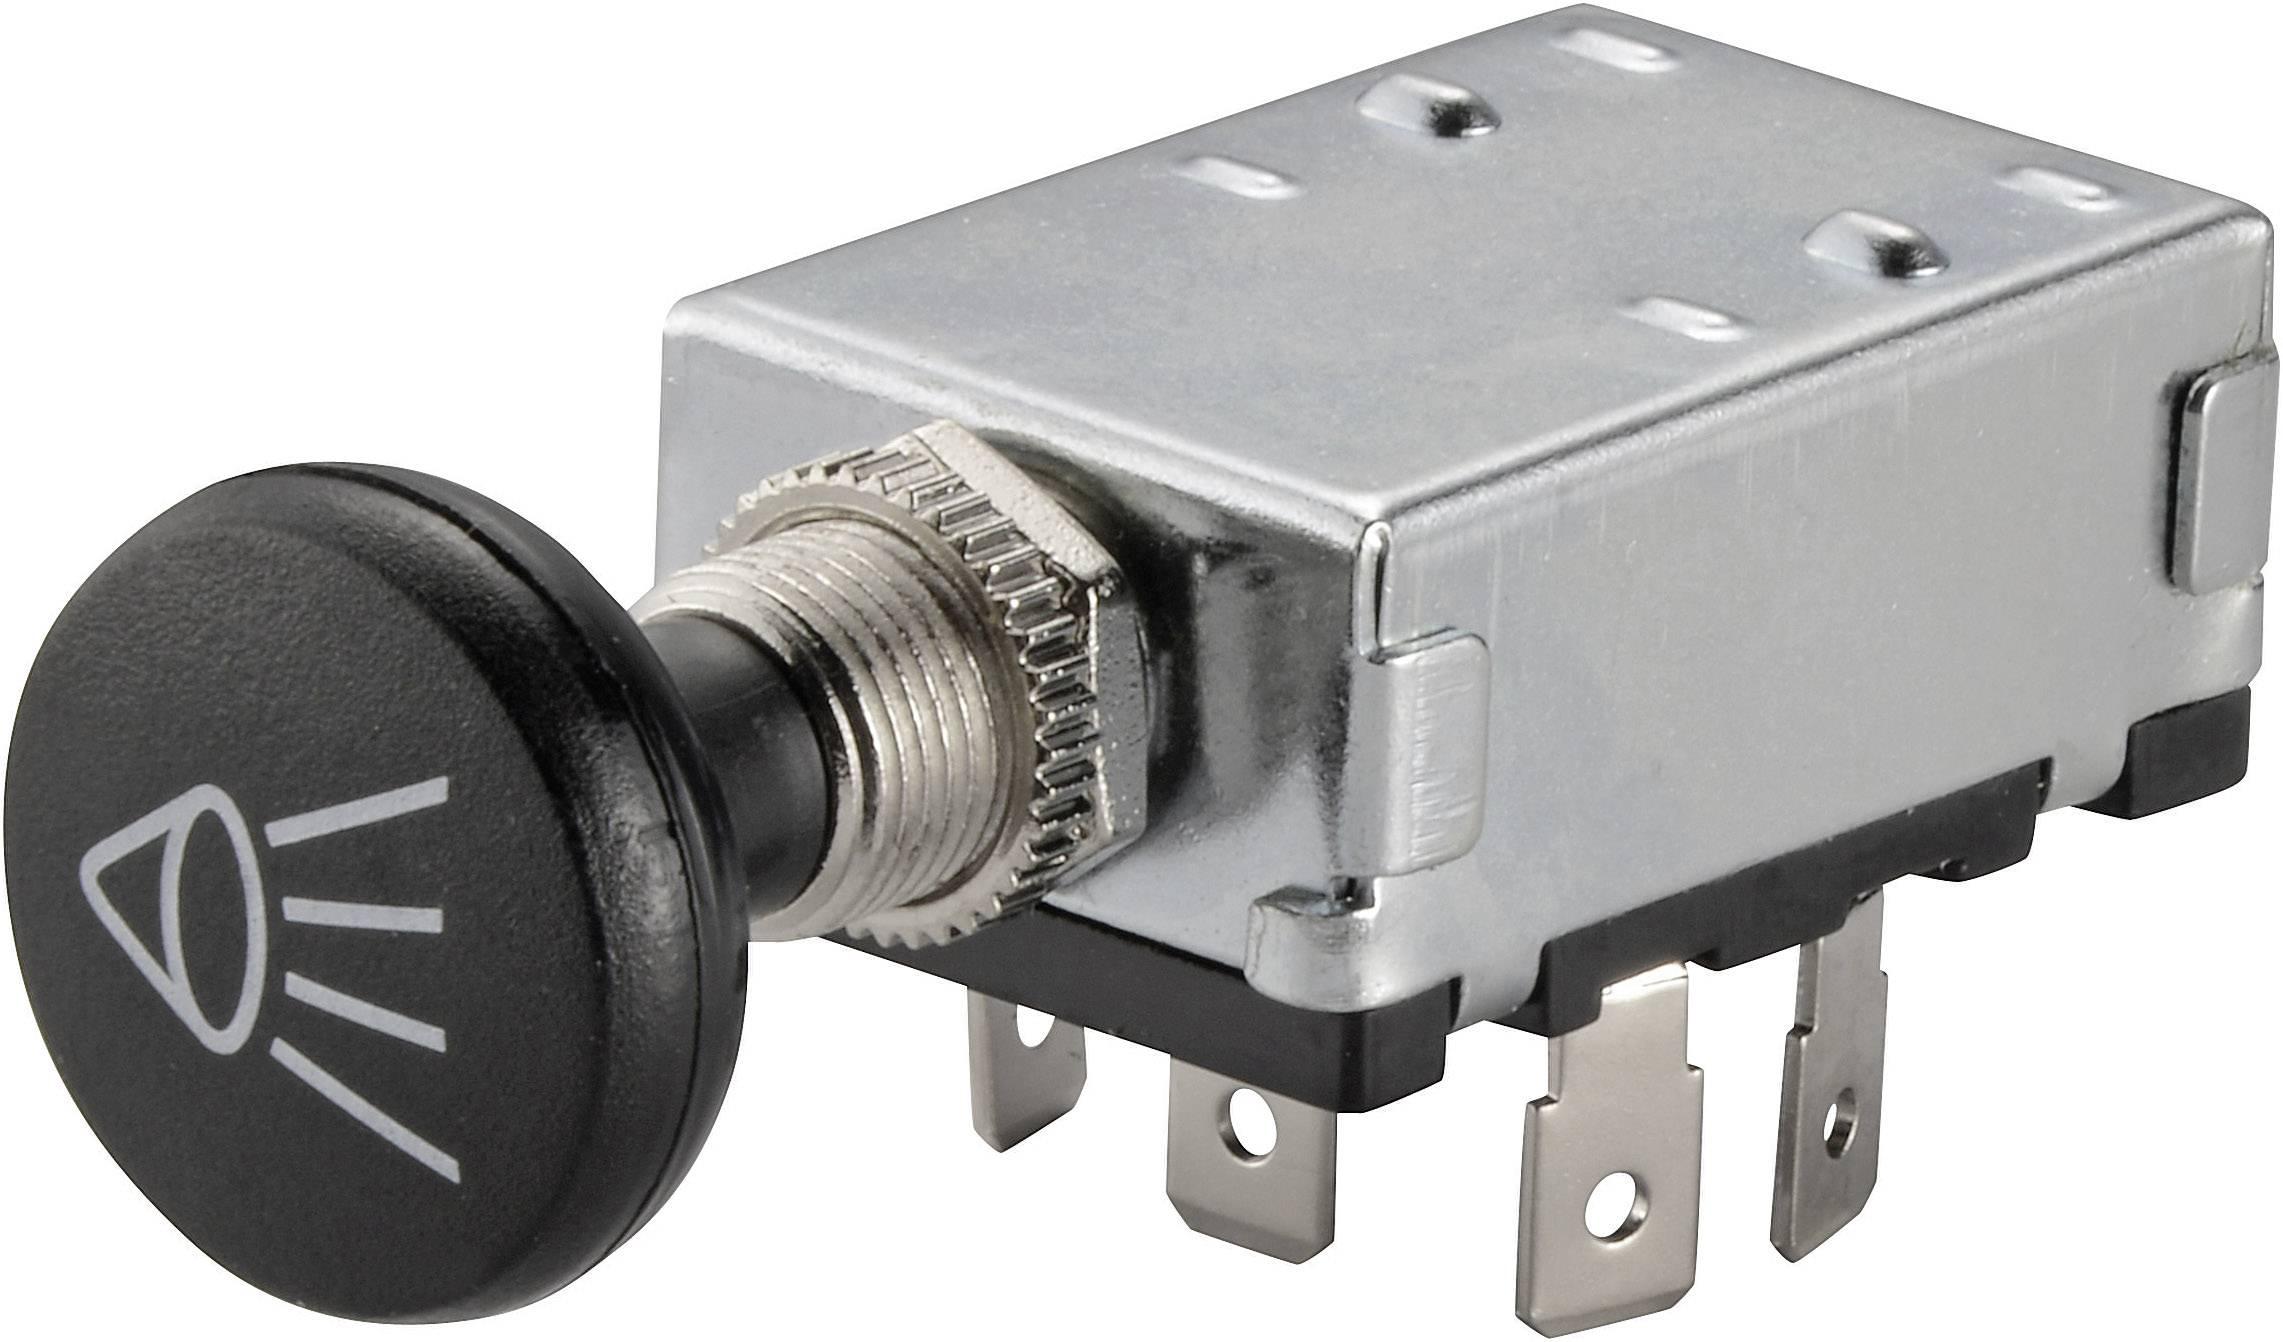 Vypínač do auta SCI A3-20B-SQ, 12 V/DC, 30 A, s aretací, 1 ks